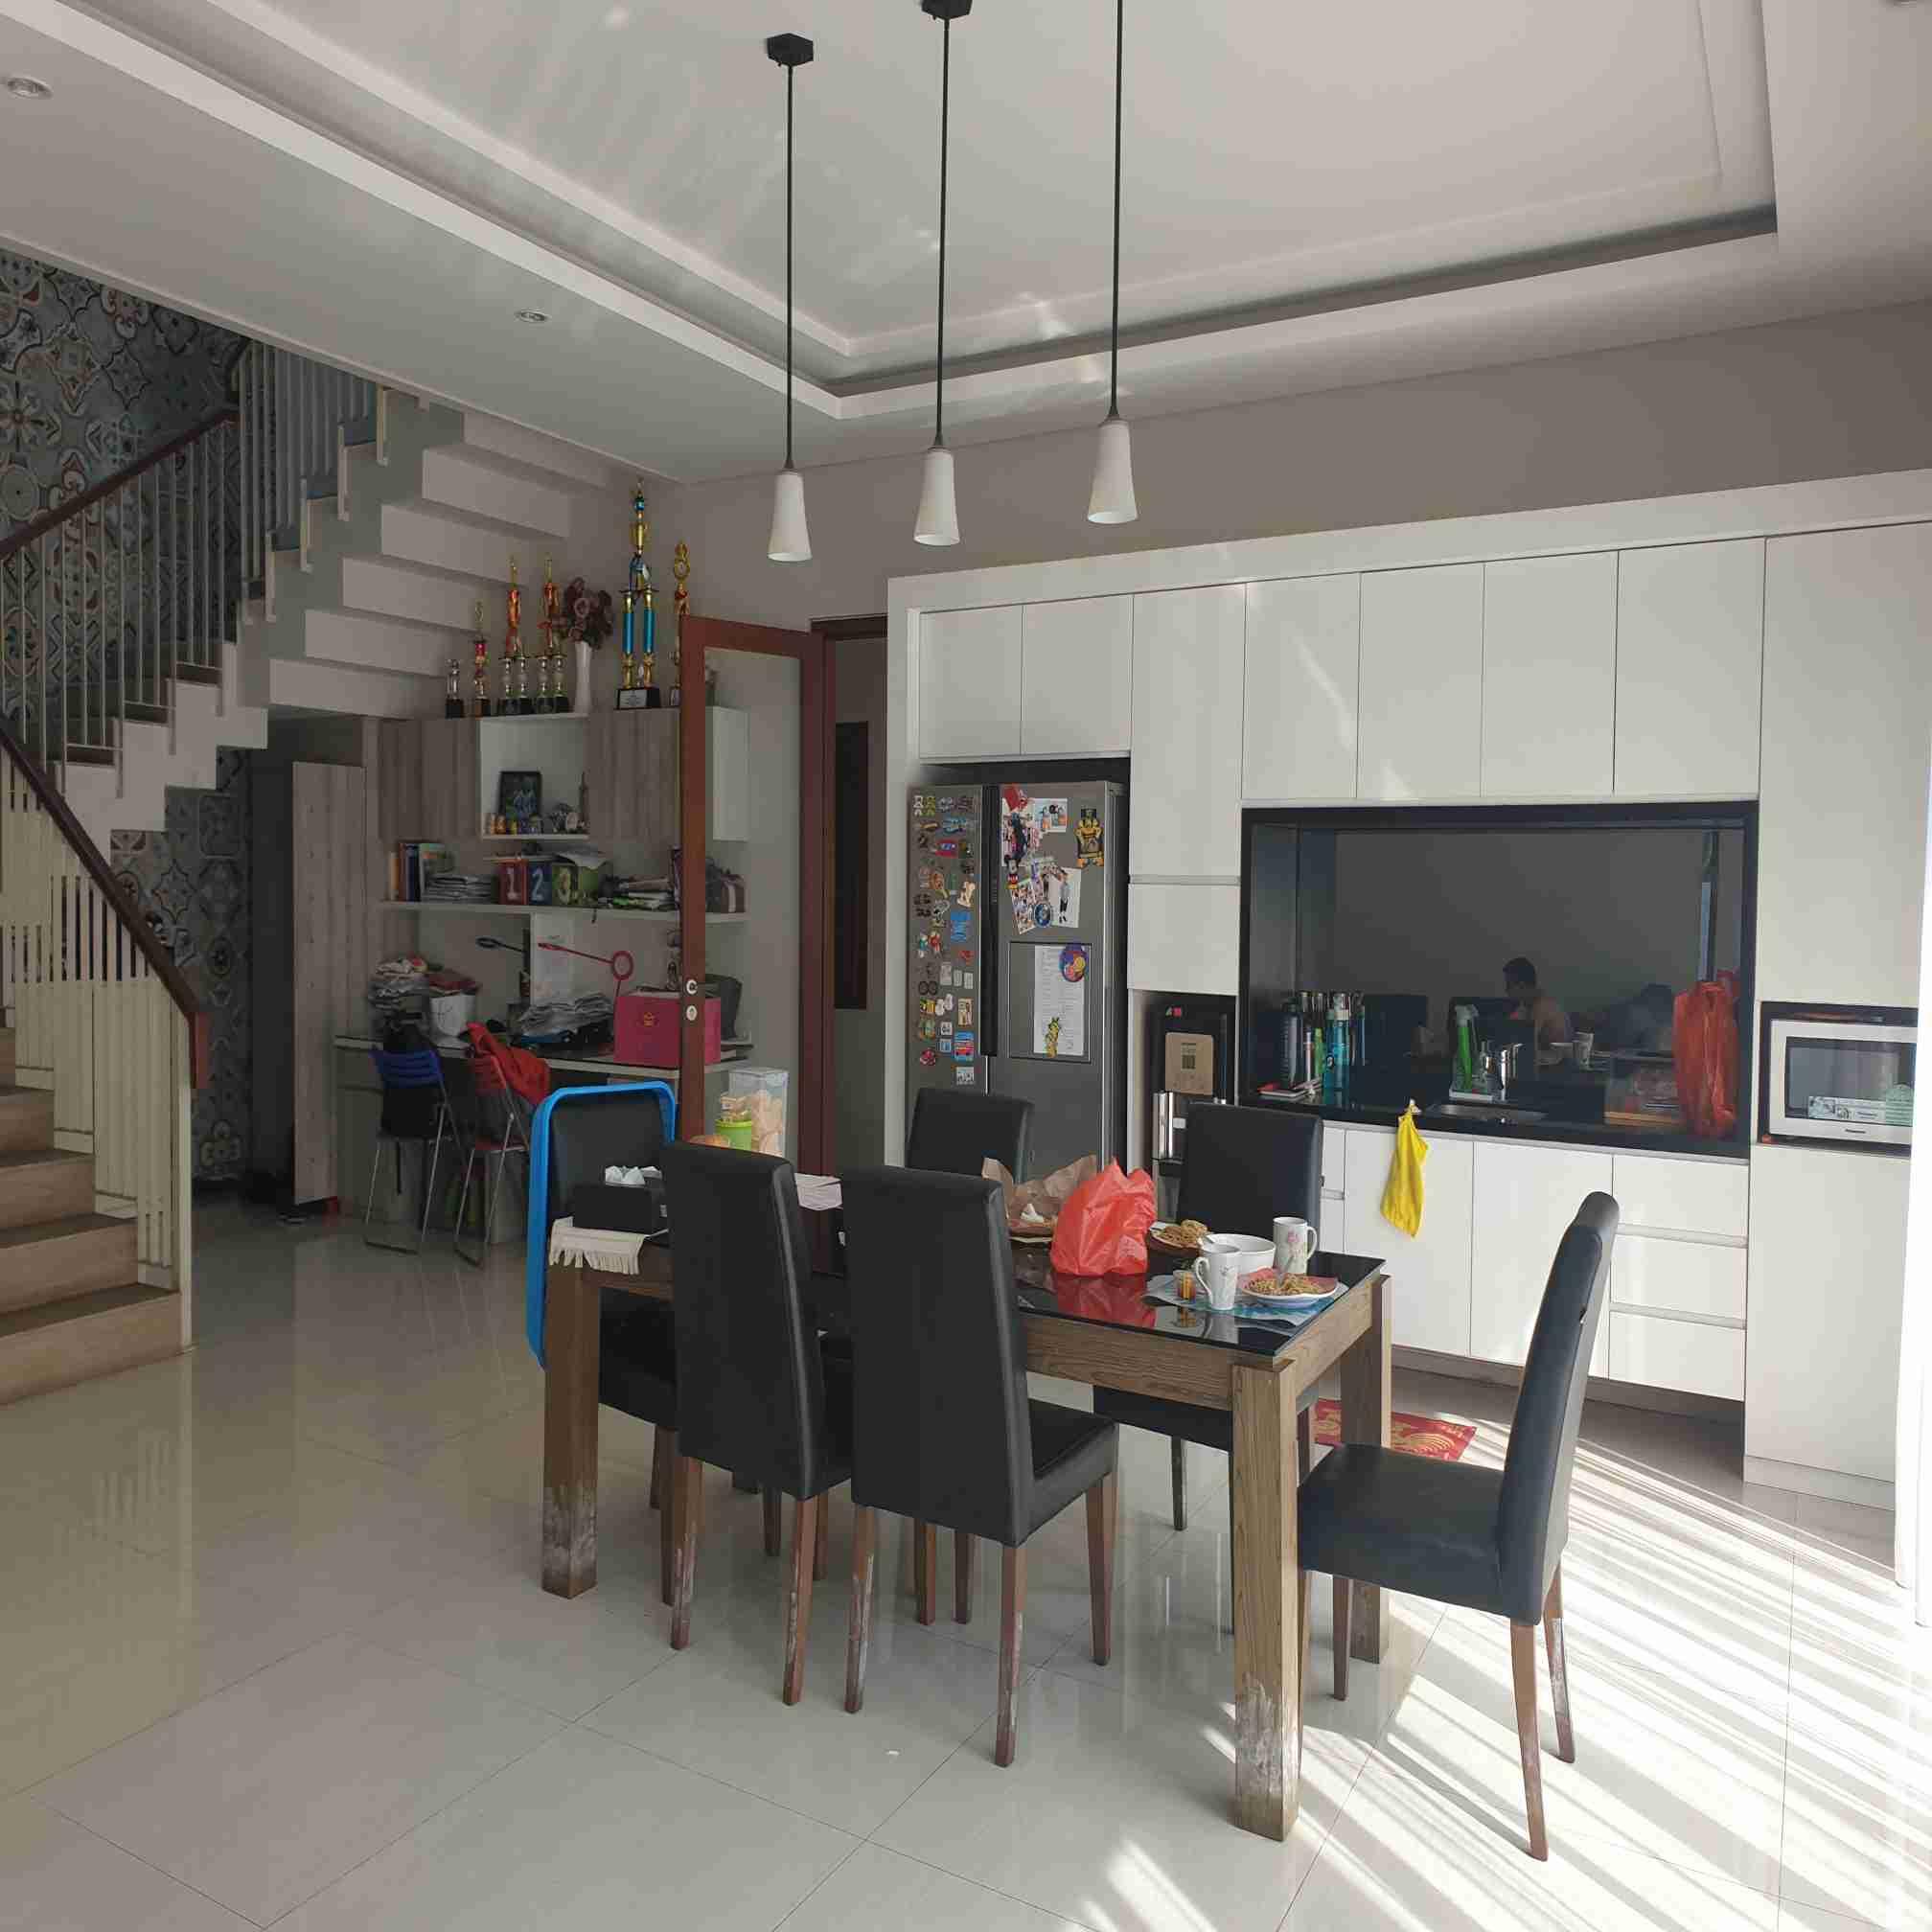 Disewakan Rumah Mewah 2 lantai di Cipinang Jaya